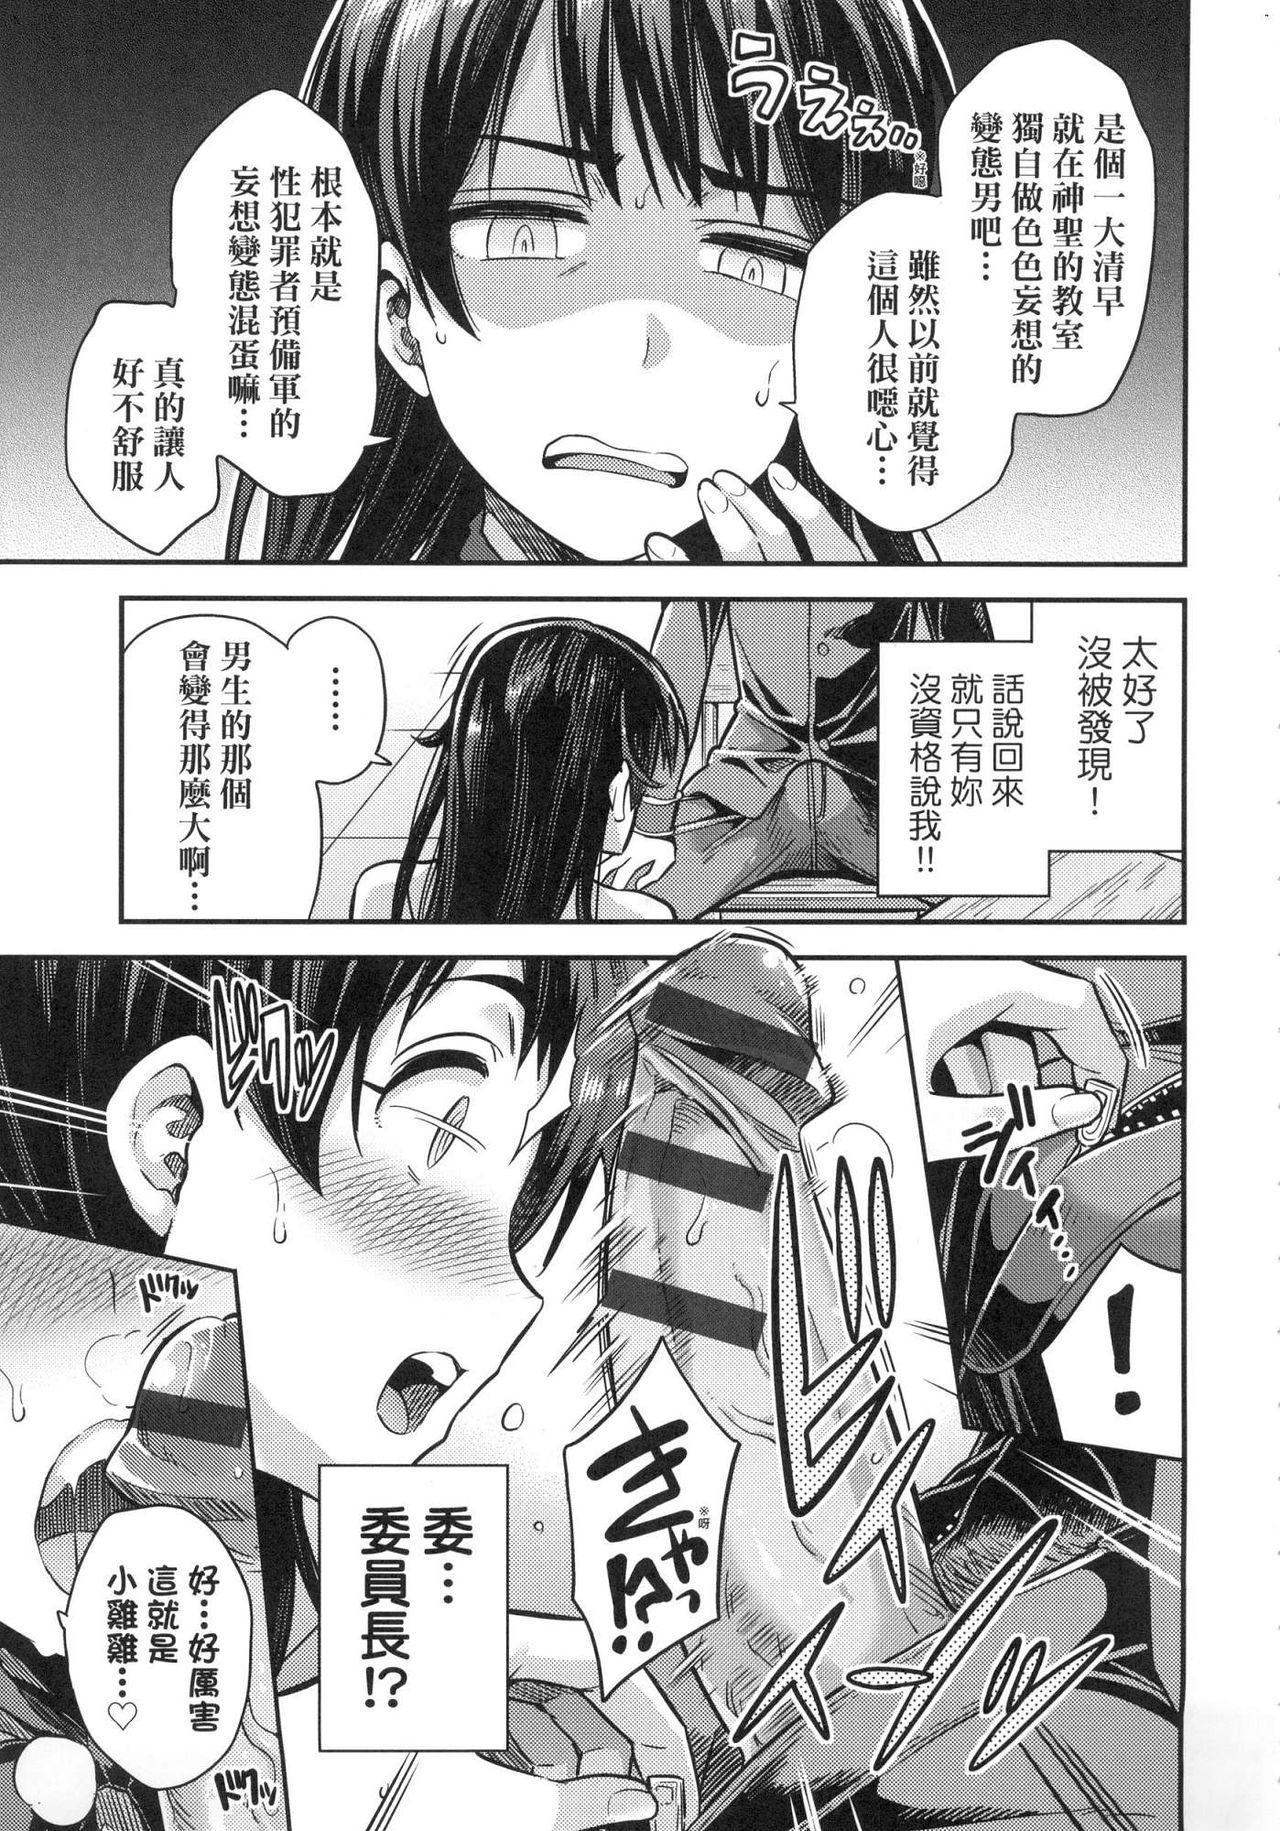 Kyousei Tanetsuke Express - Forced Seeding Express 34